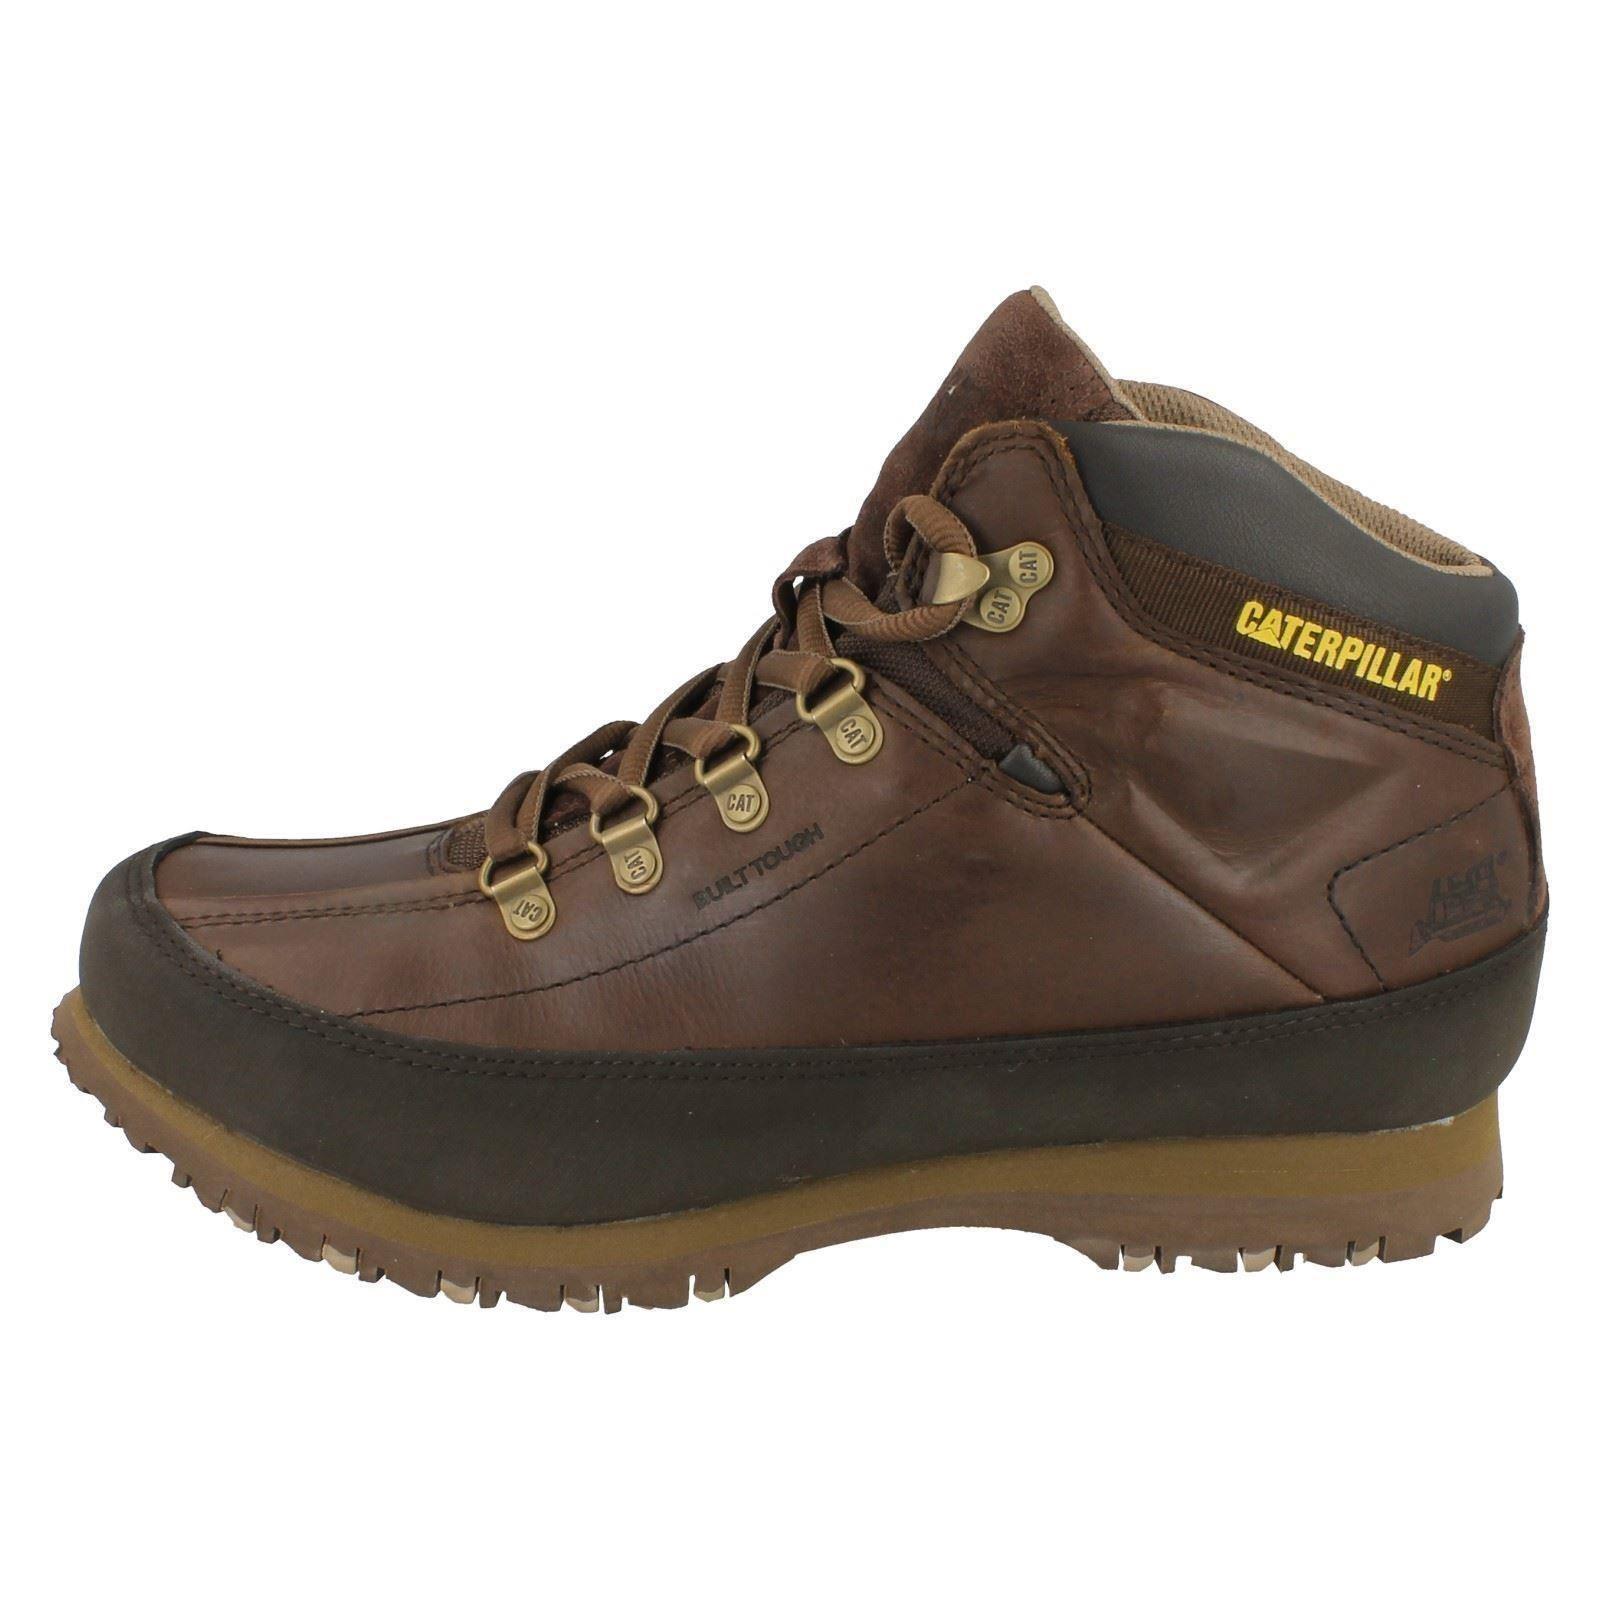 Mens Caterpillar Restore Boots The Style - Restore Caterpillar ac07c5